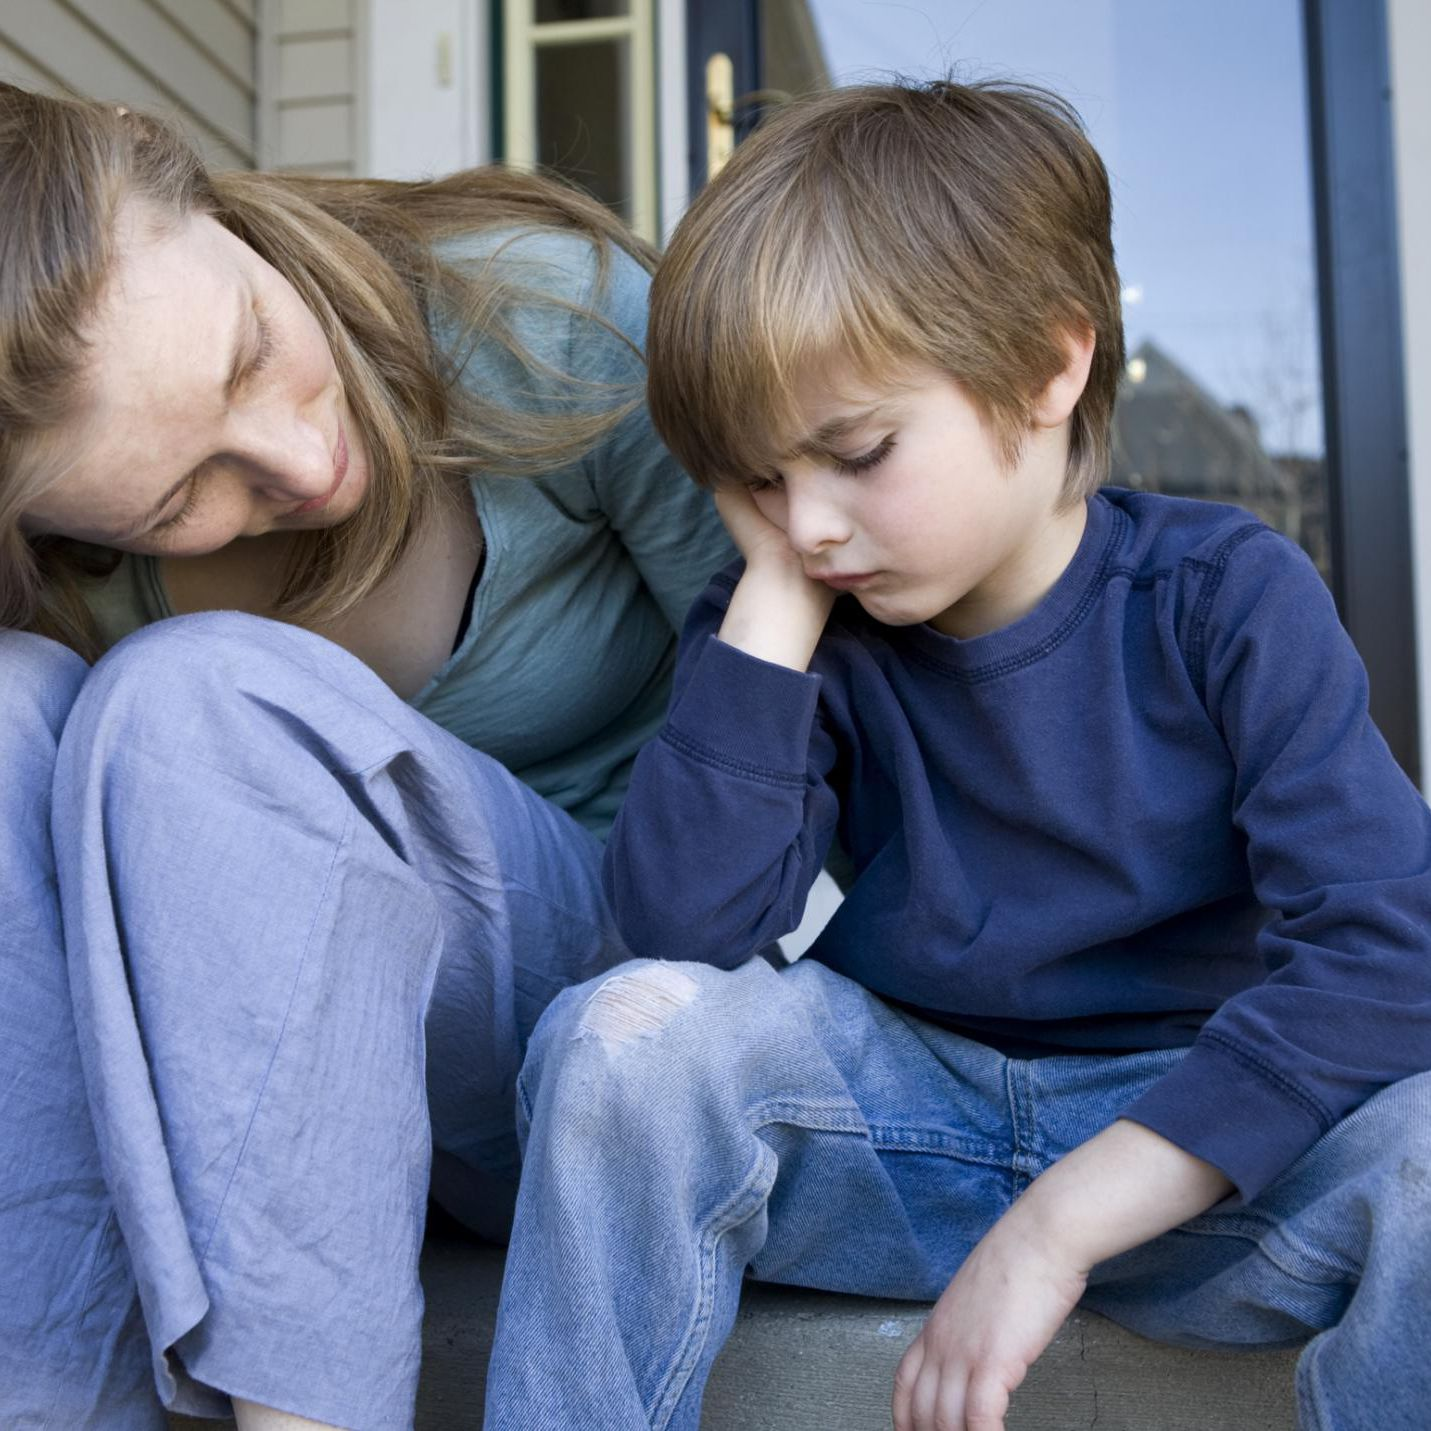 Statistics on Fatherless Children in America